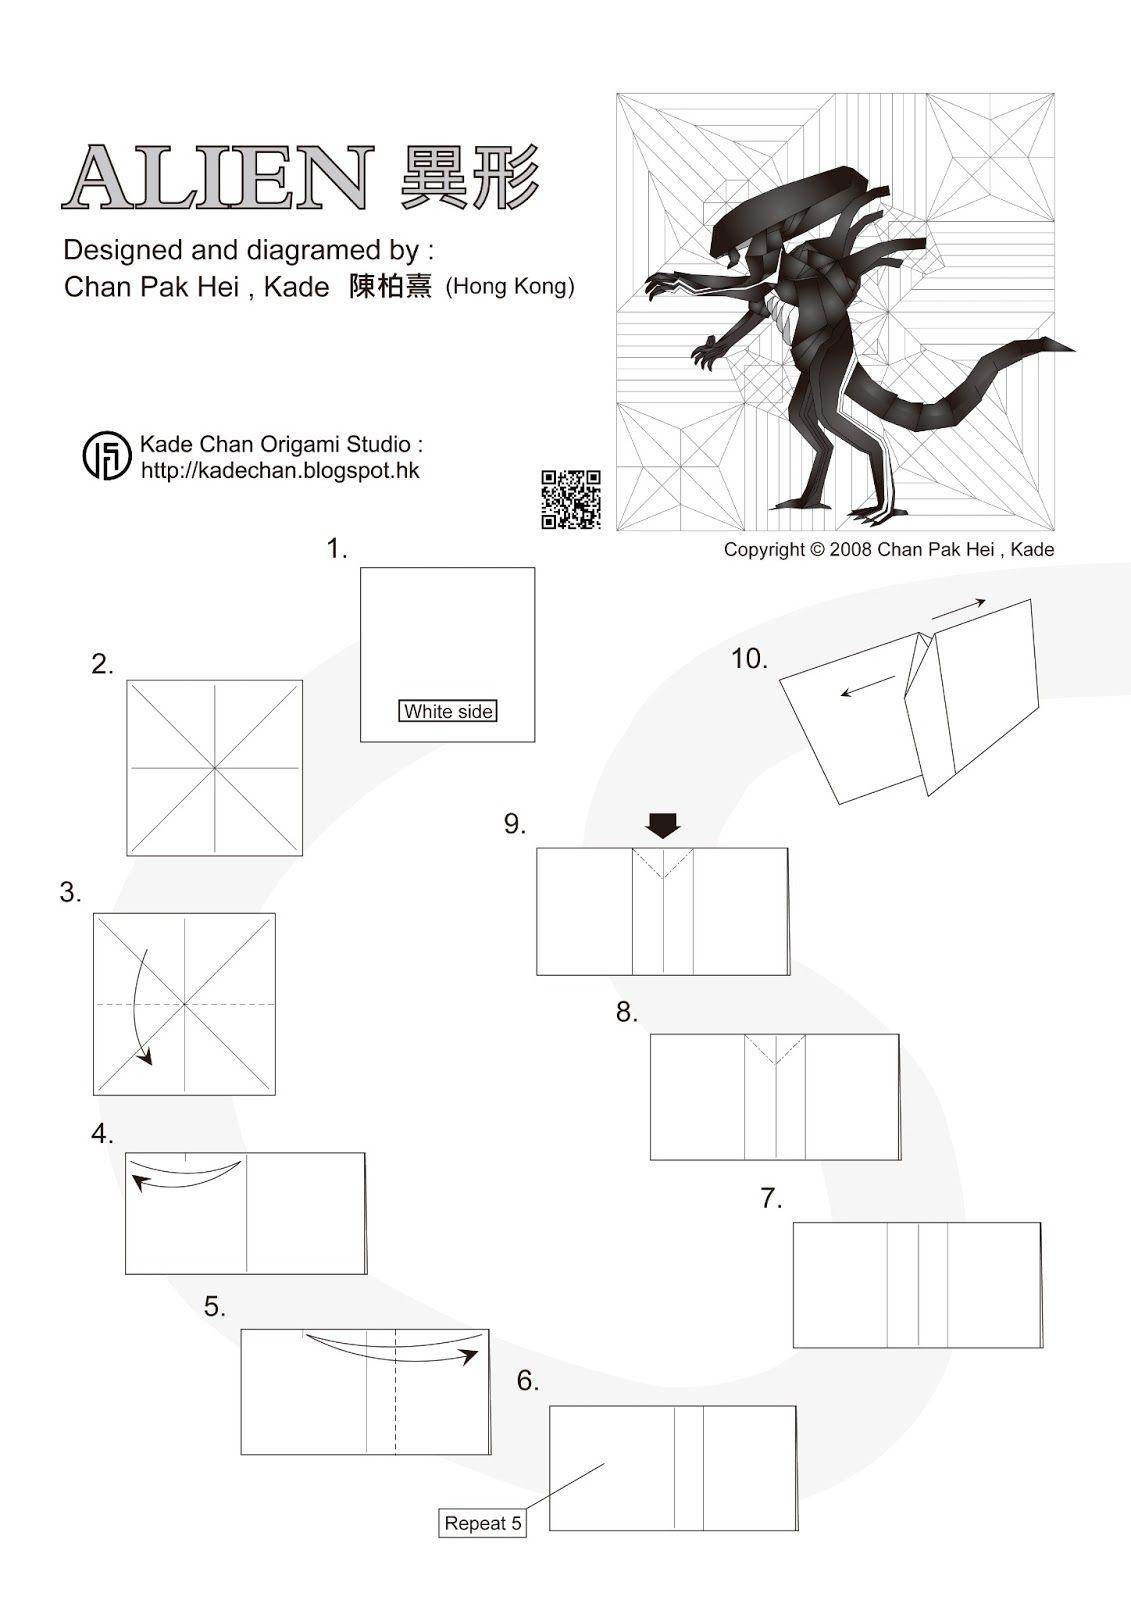 Origami alien xenomorph by kade chan origami studio origami origami alien xenomorph by kade chan origami studio jeuxipadfo Images